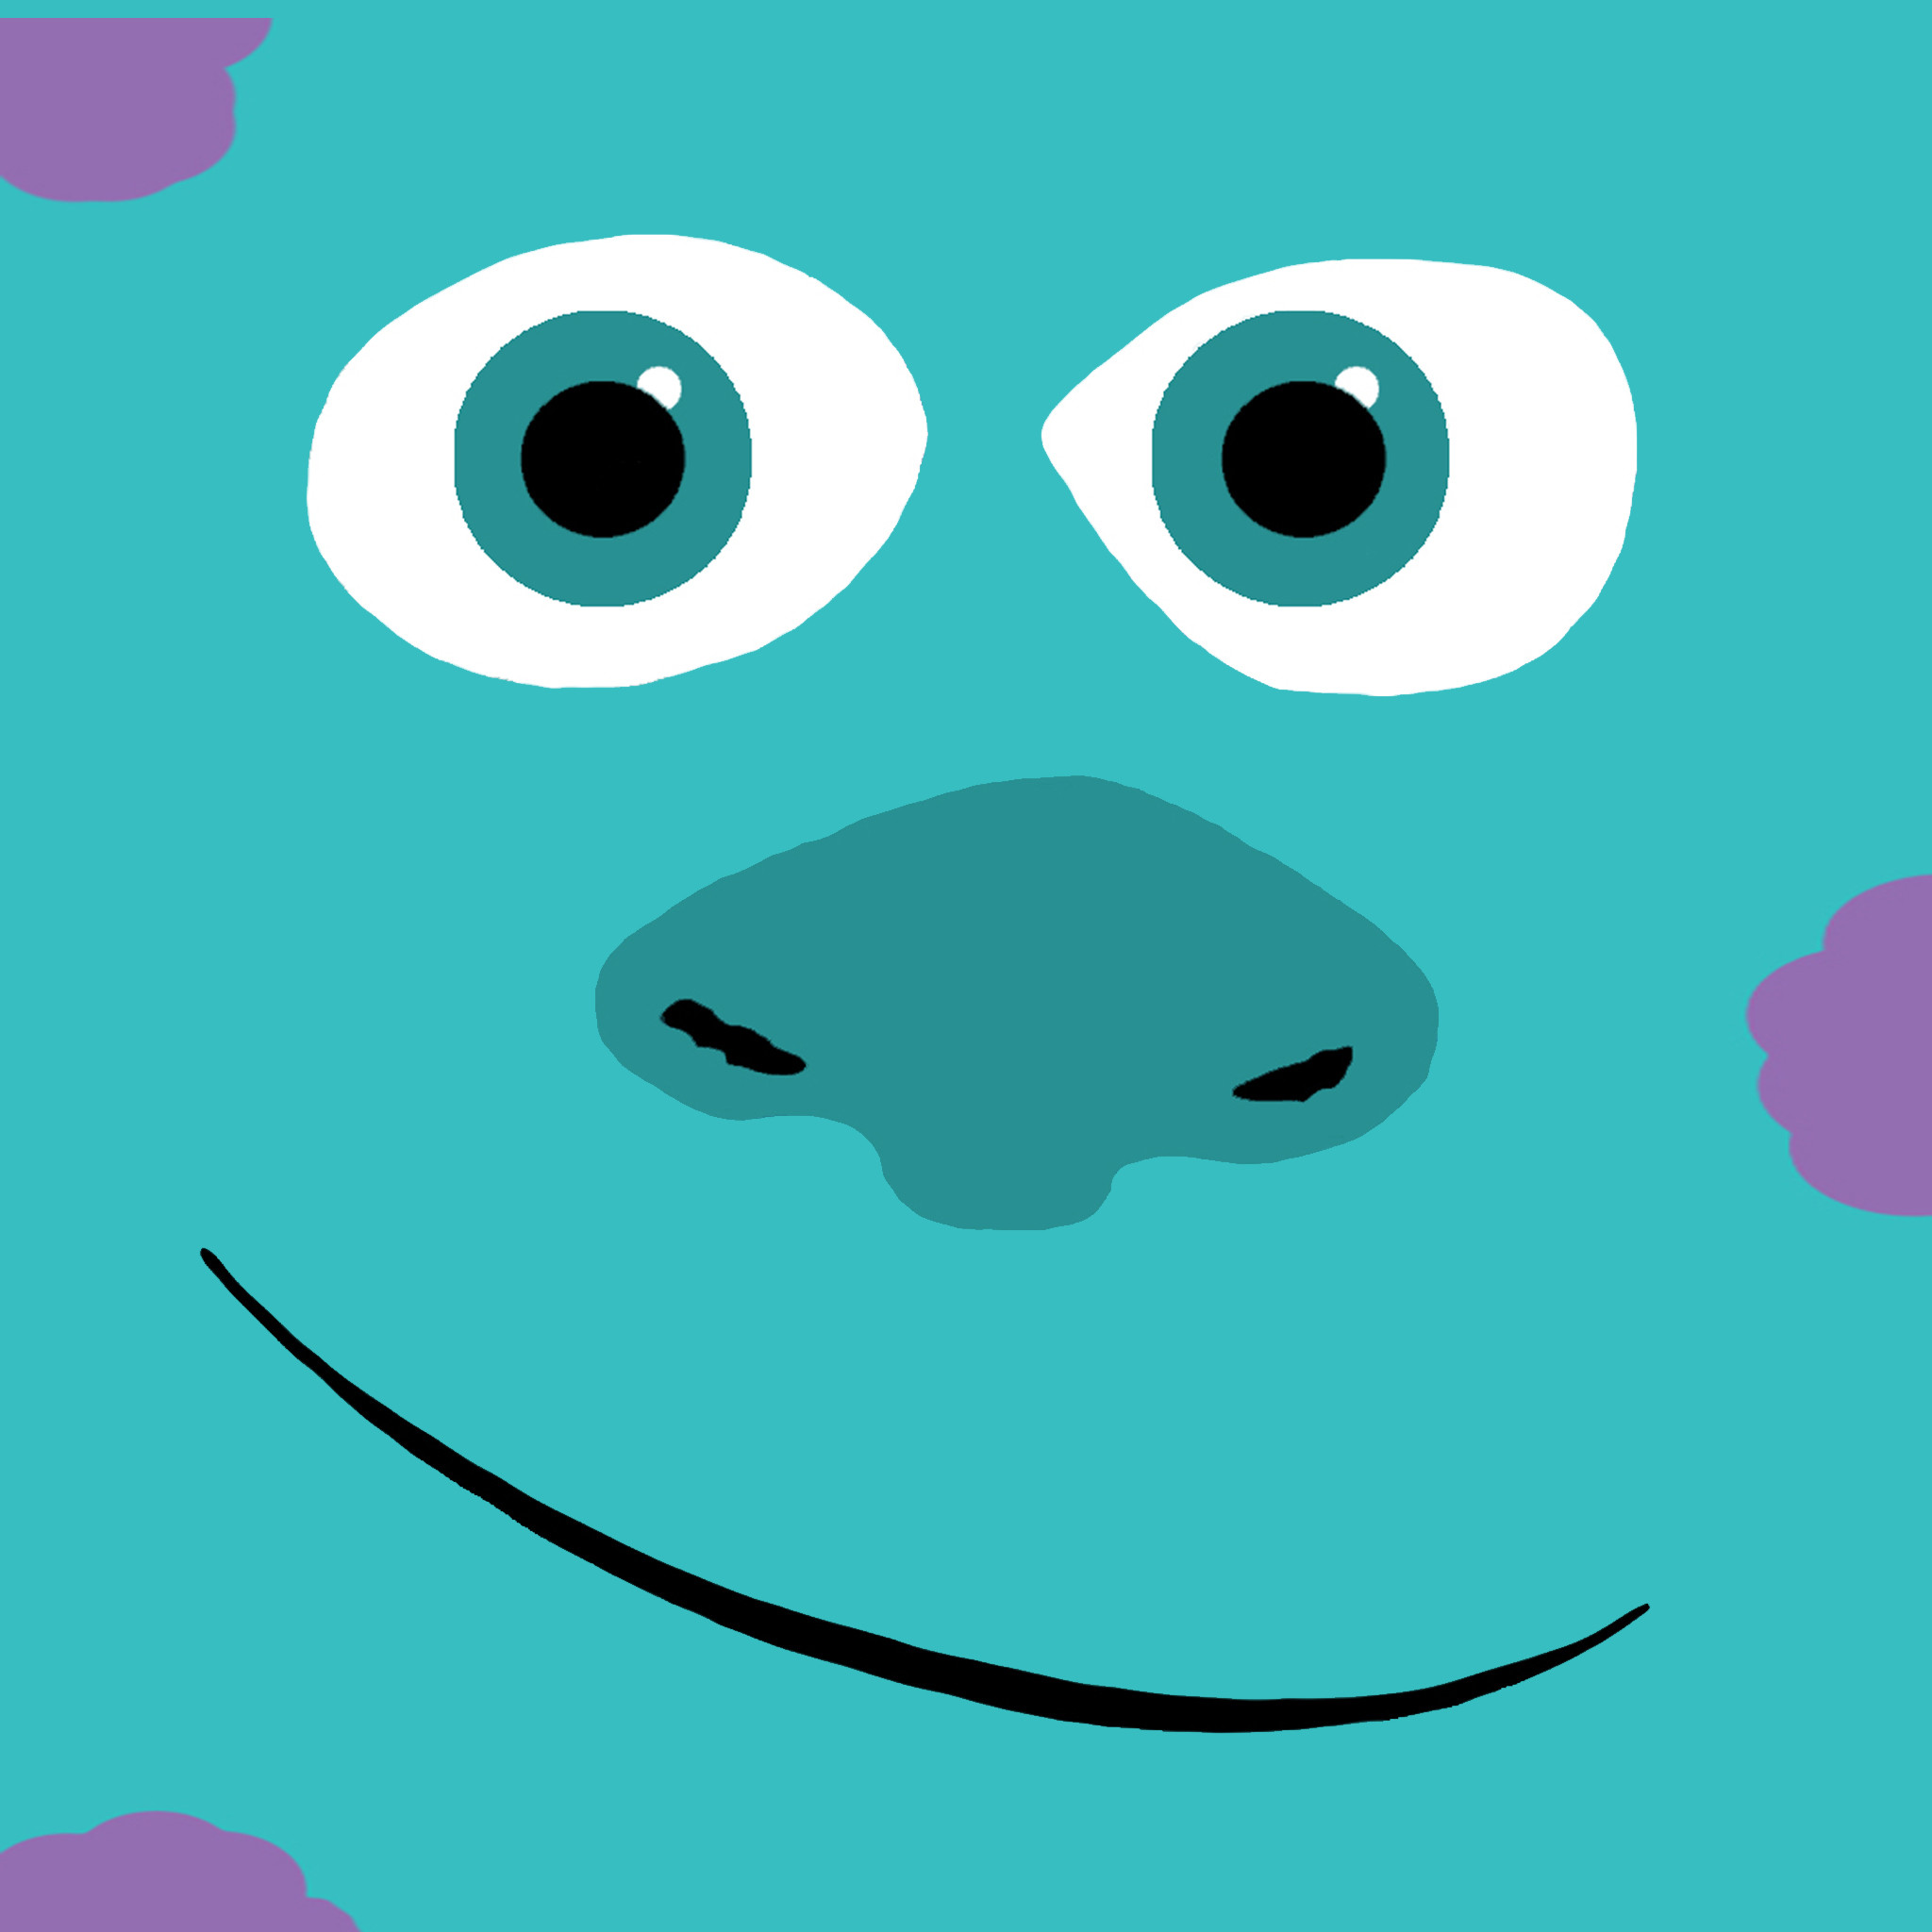 Cute Mike Wazowski Wallpaper Cute Cookie Monster Wallpaper 58 Images